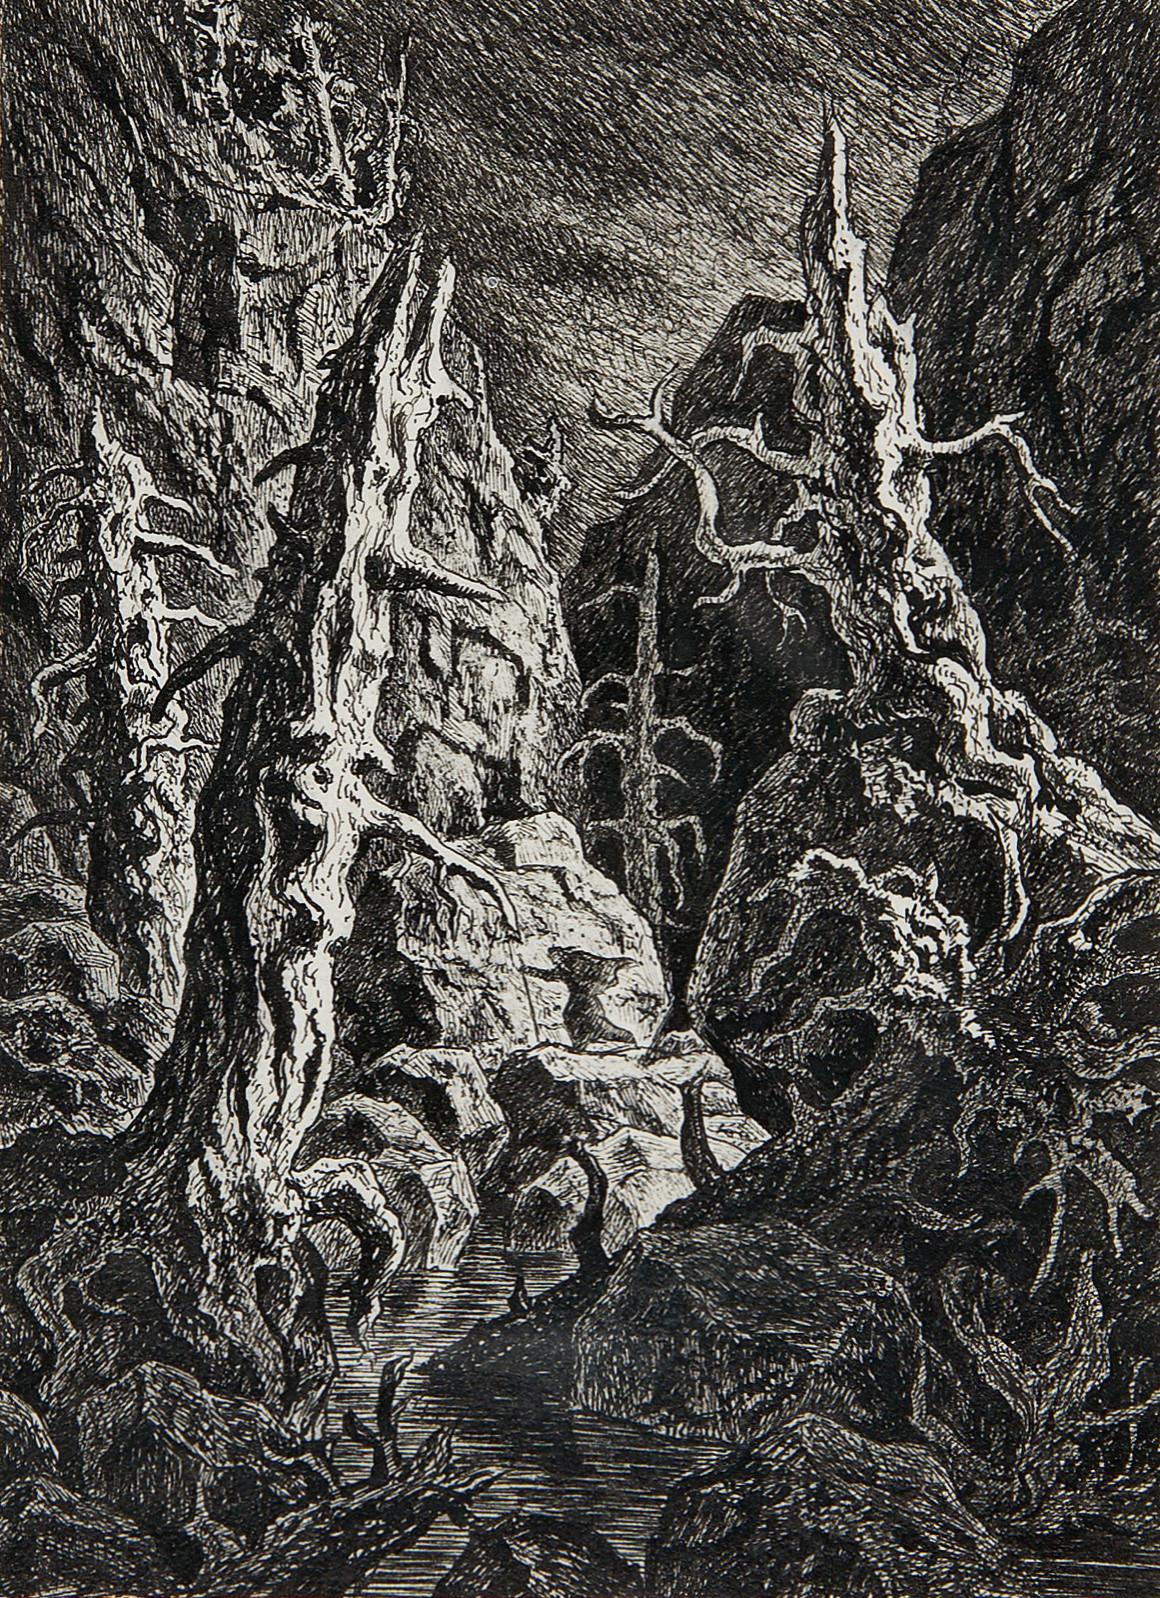 Fritz Schwimbeck - Rocky landscape, 1920